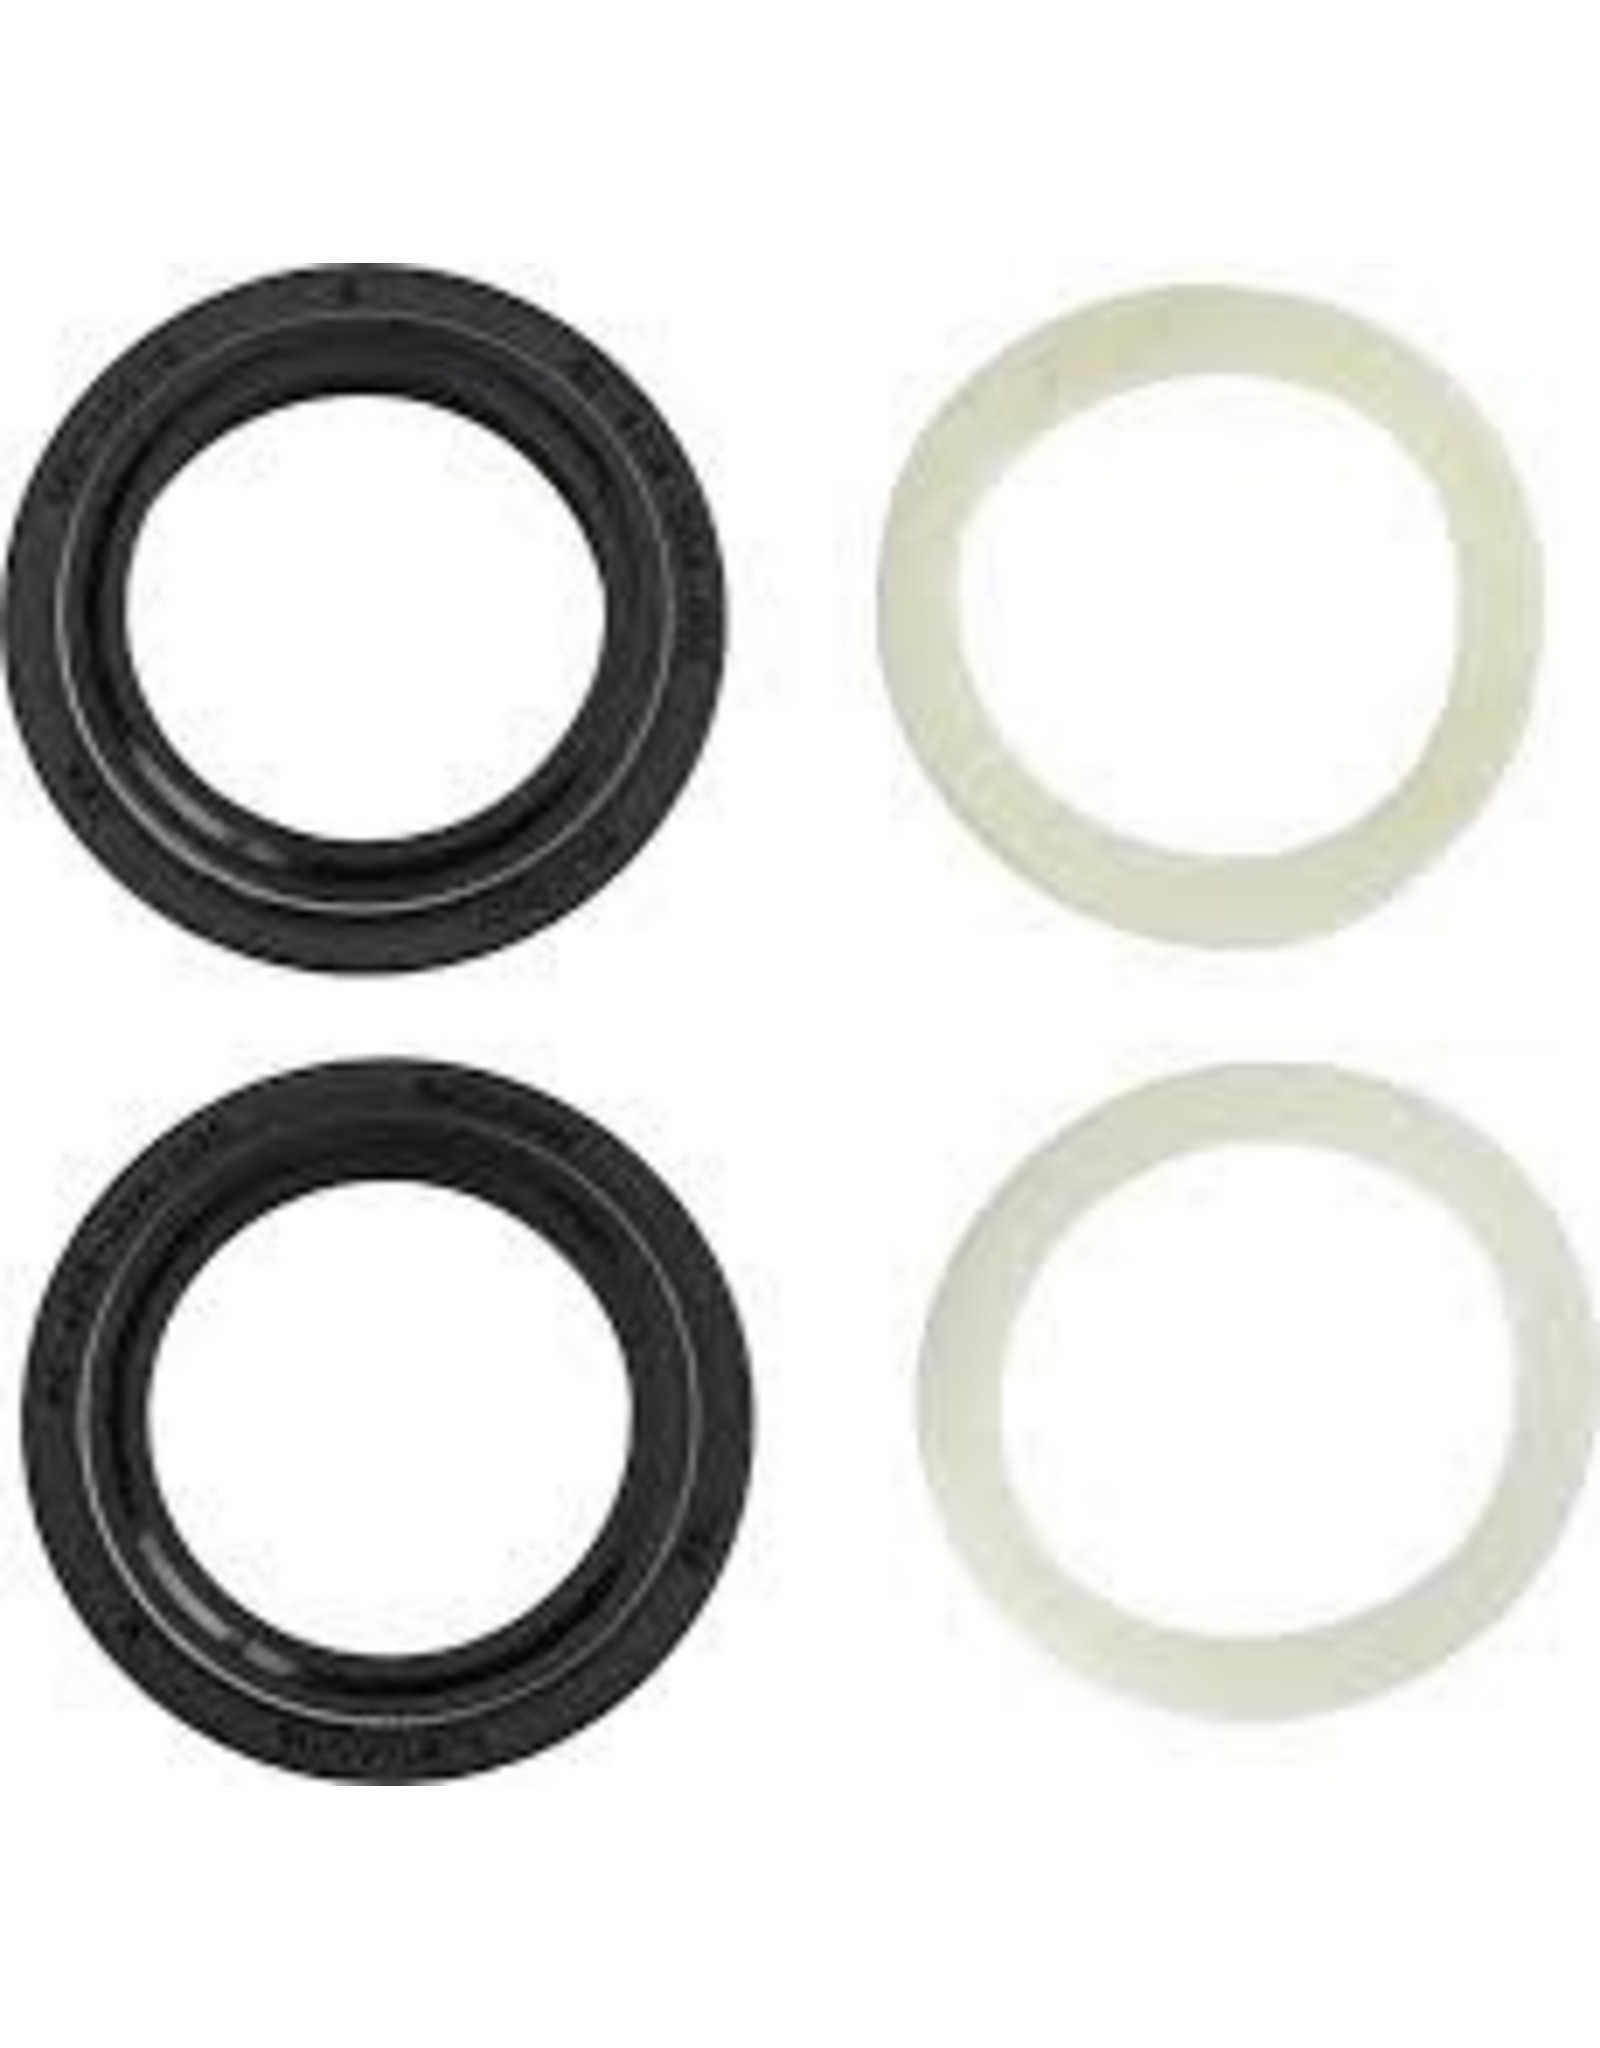 RockShox RockShox Dust Seal/Foam Ring: Black Flanged 32mm Seal, 5mm Foam Ring - SID A1-A3 /Reba A1-A4